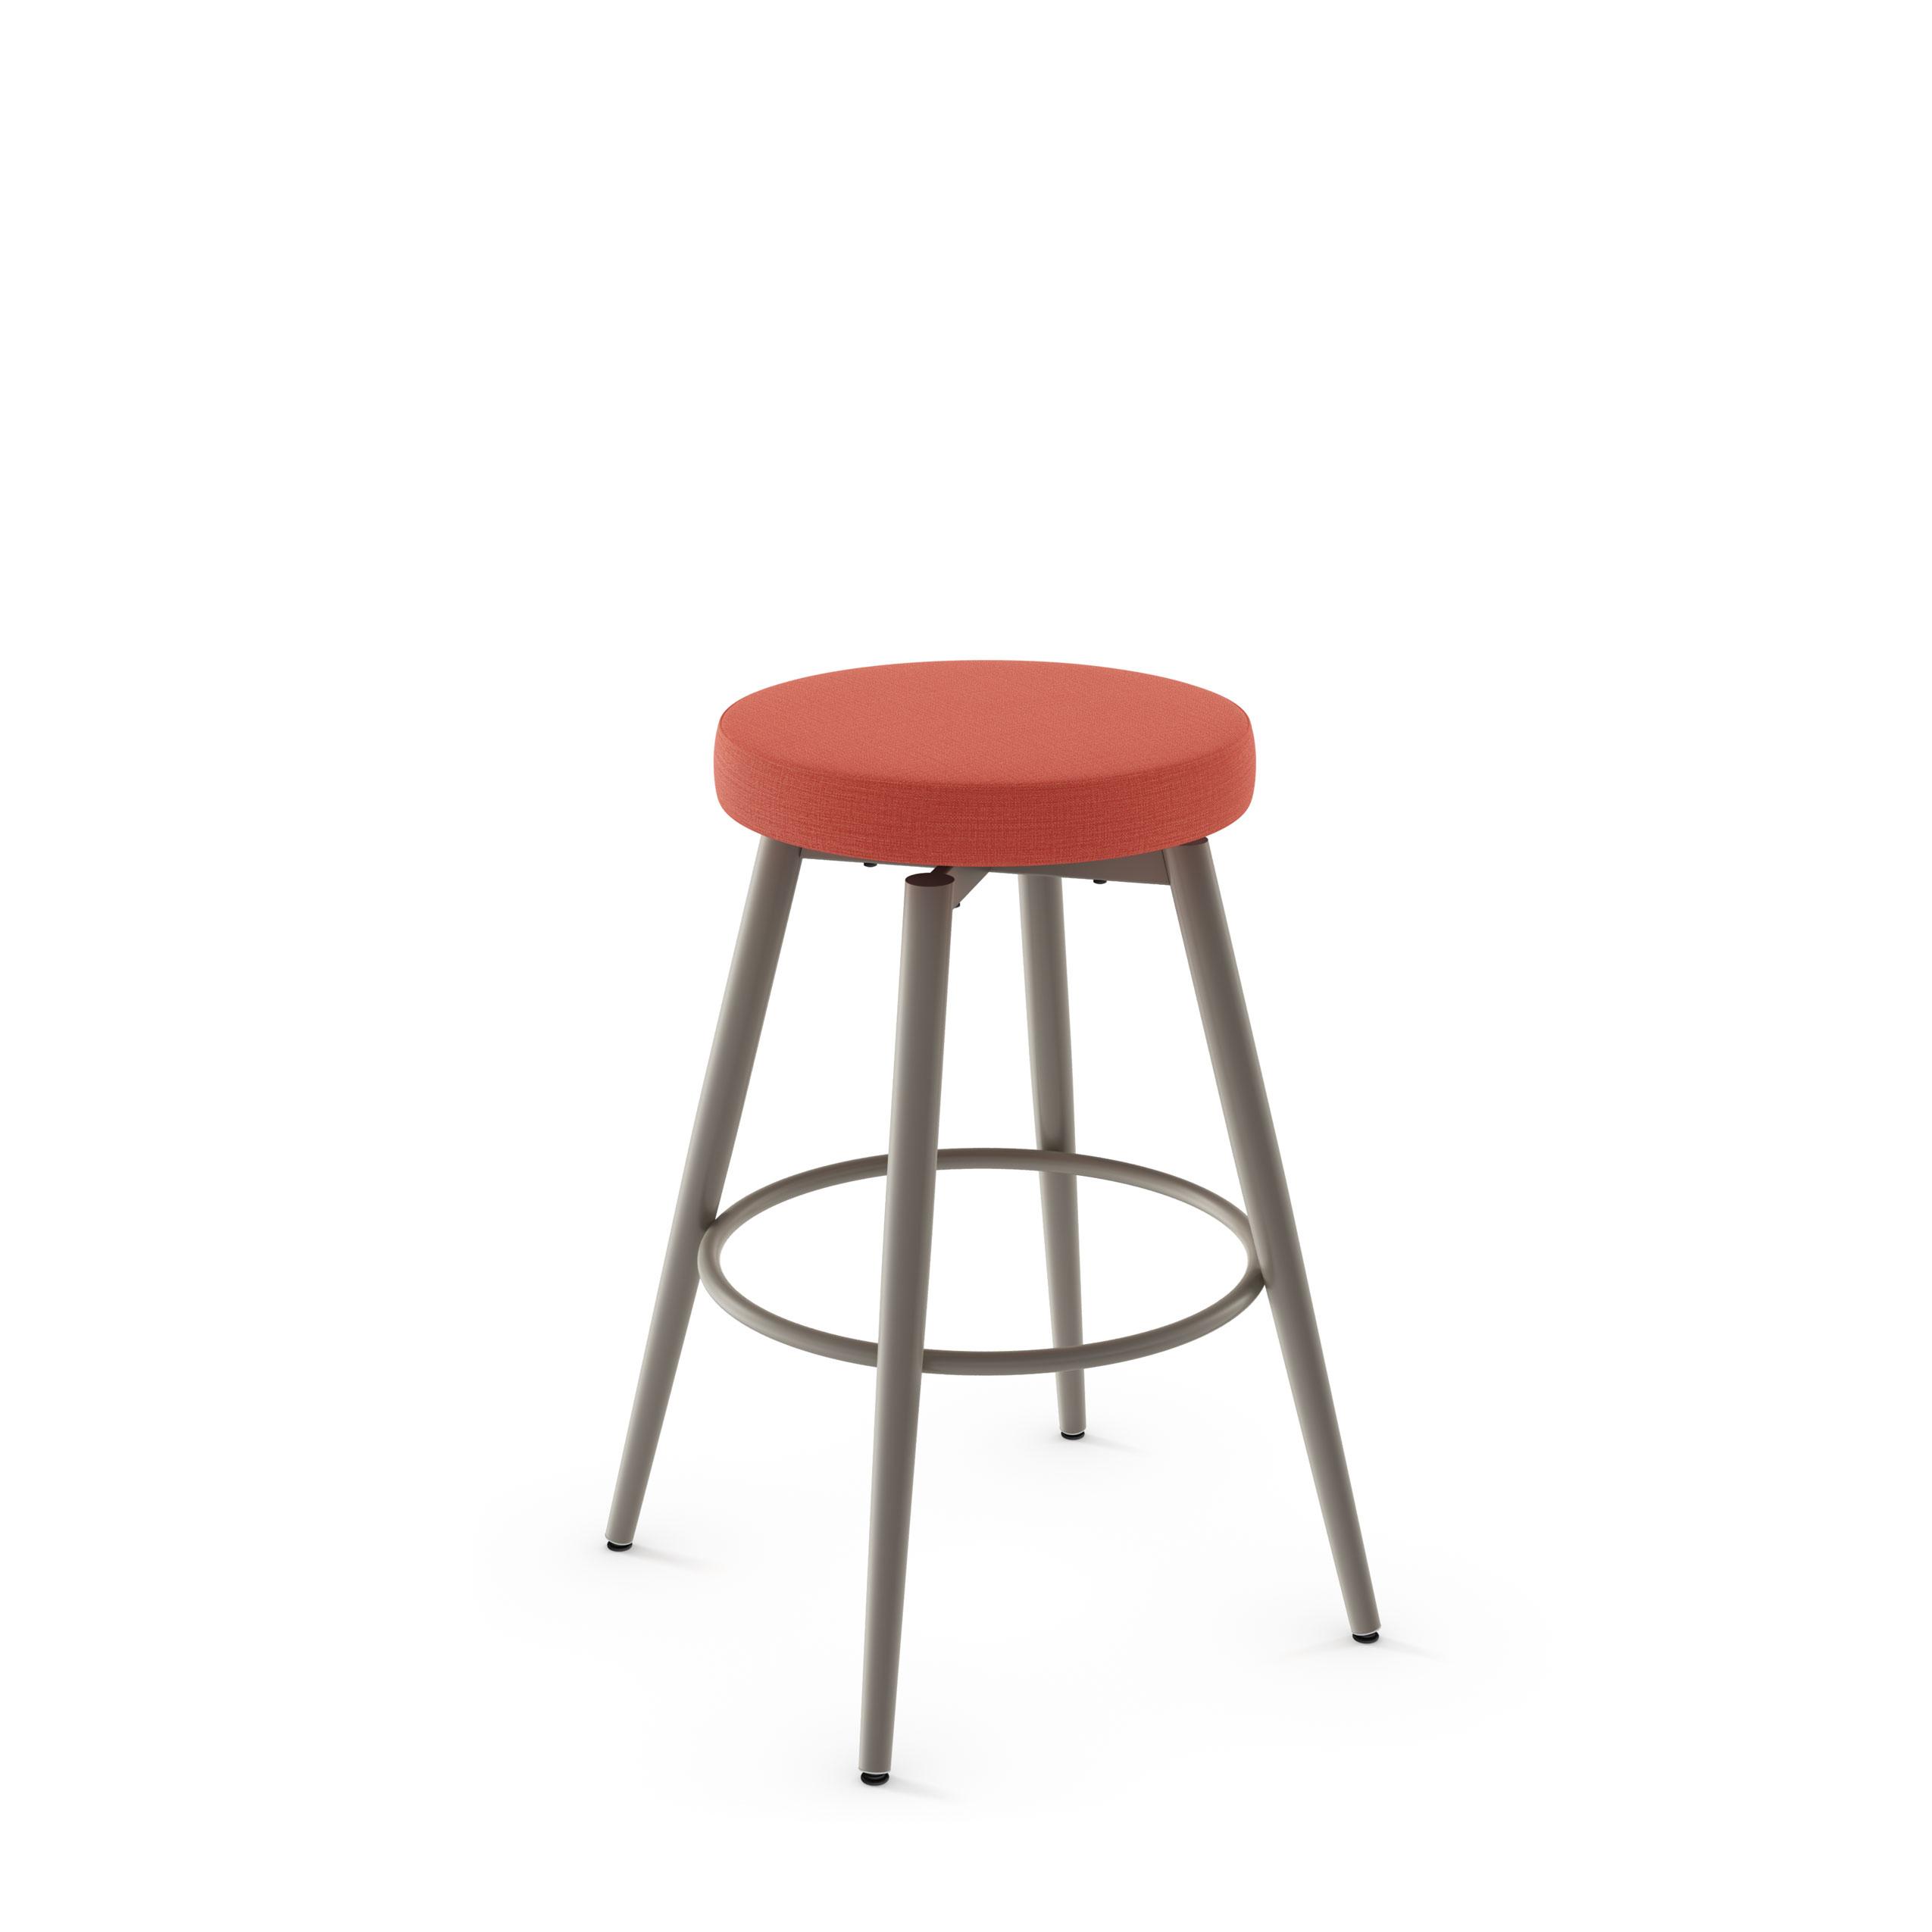 nox-stool